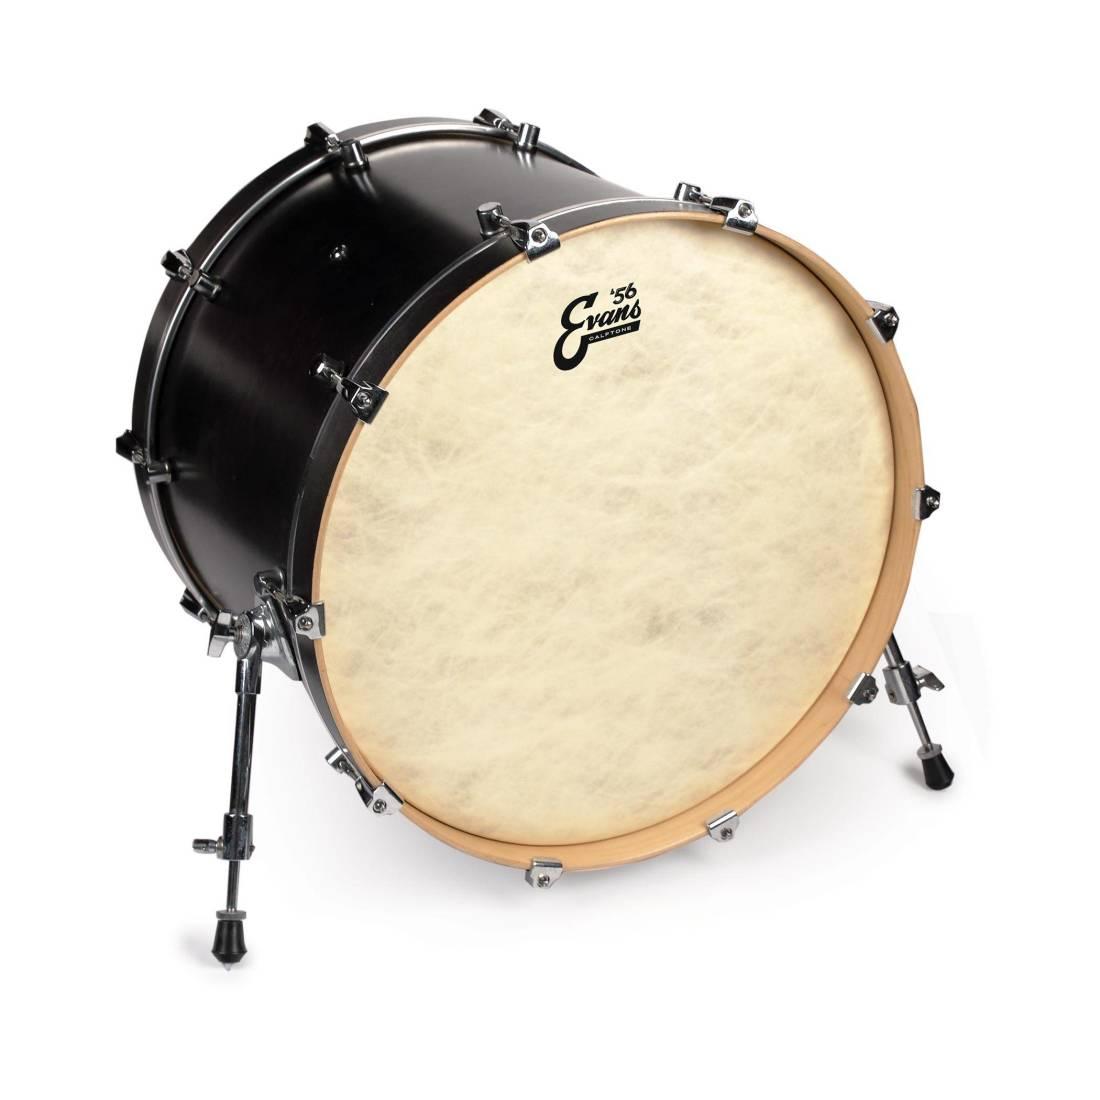 evans calftone bass drum head 24 inch long mcquade musical instruments. Black Bedroom Furniture Sets. Home Design Ideas